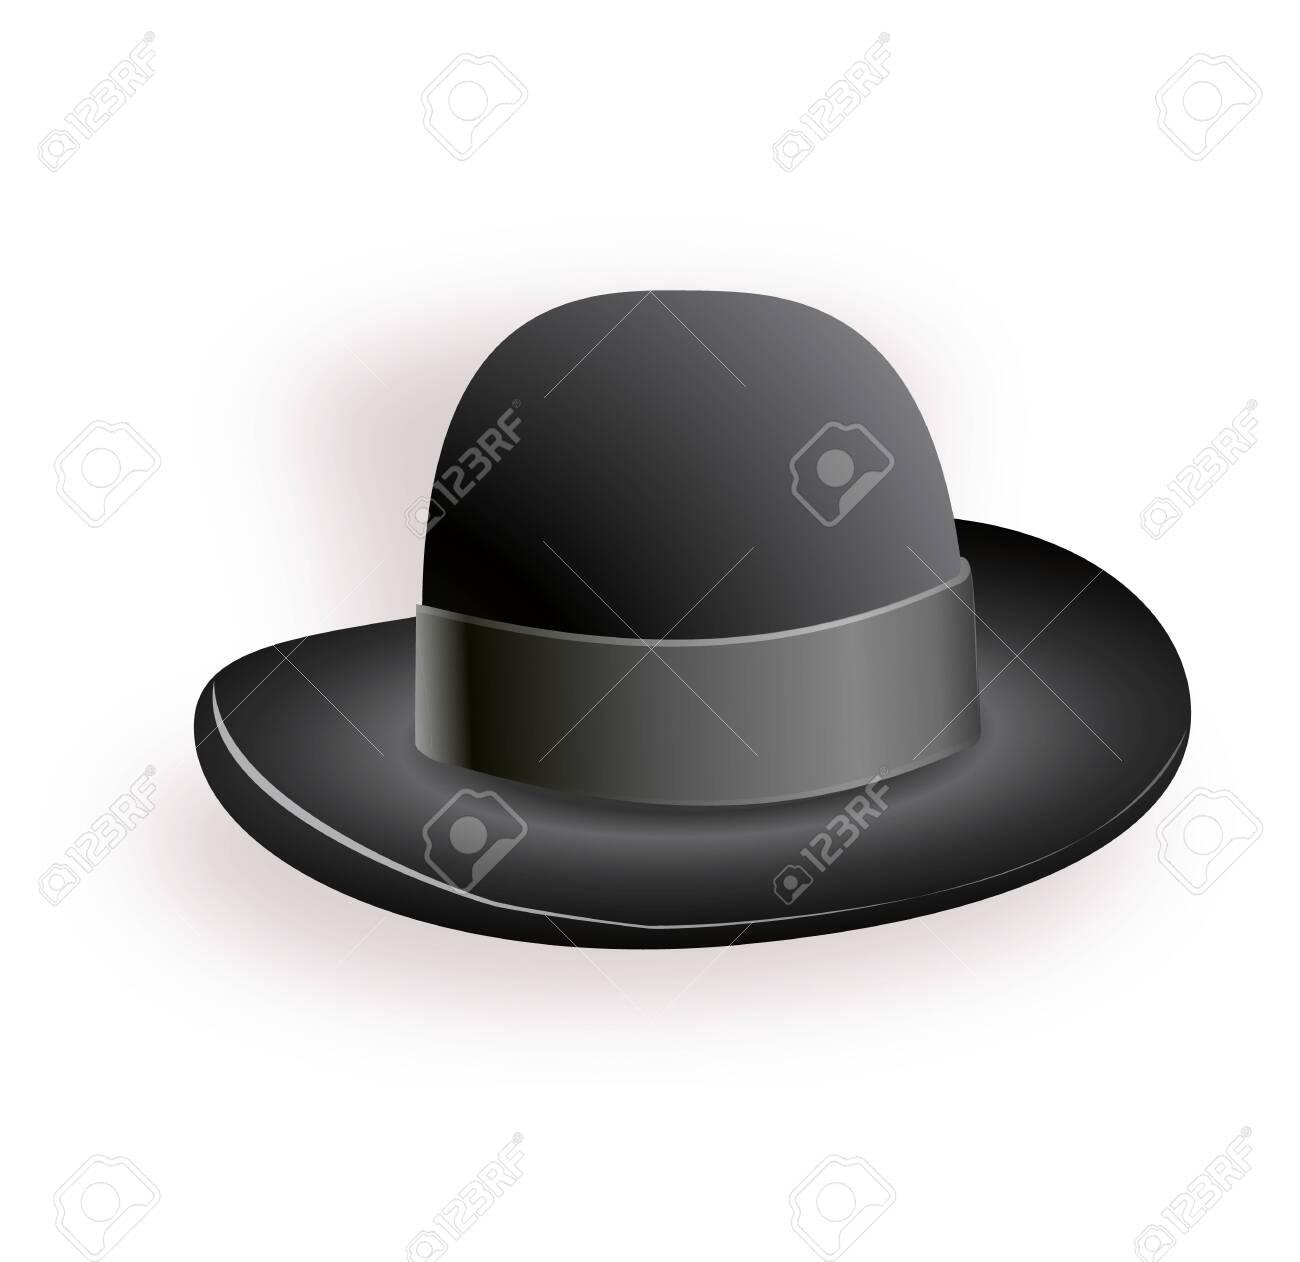 Black hat with black ribbon. Magic hat. Vector hat illustration EPS10 - 149657975